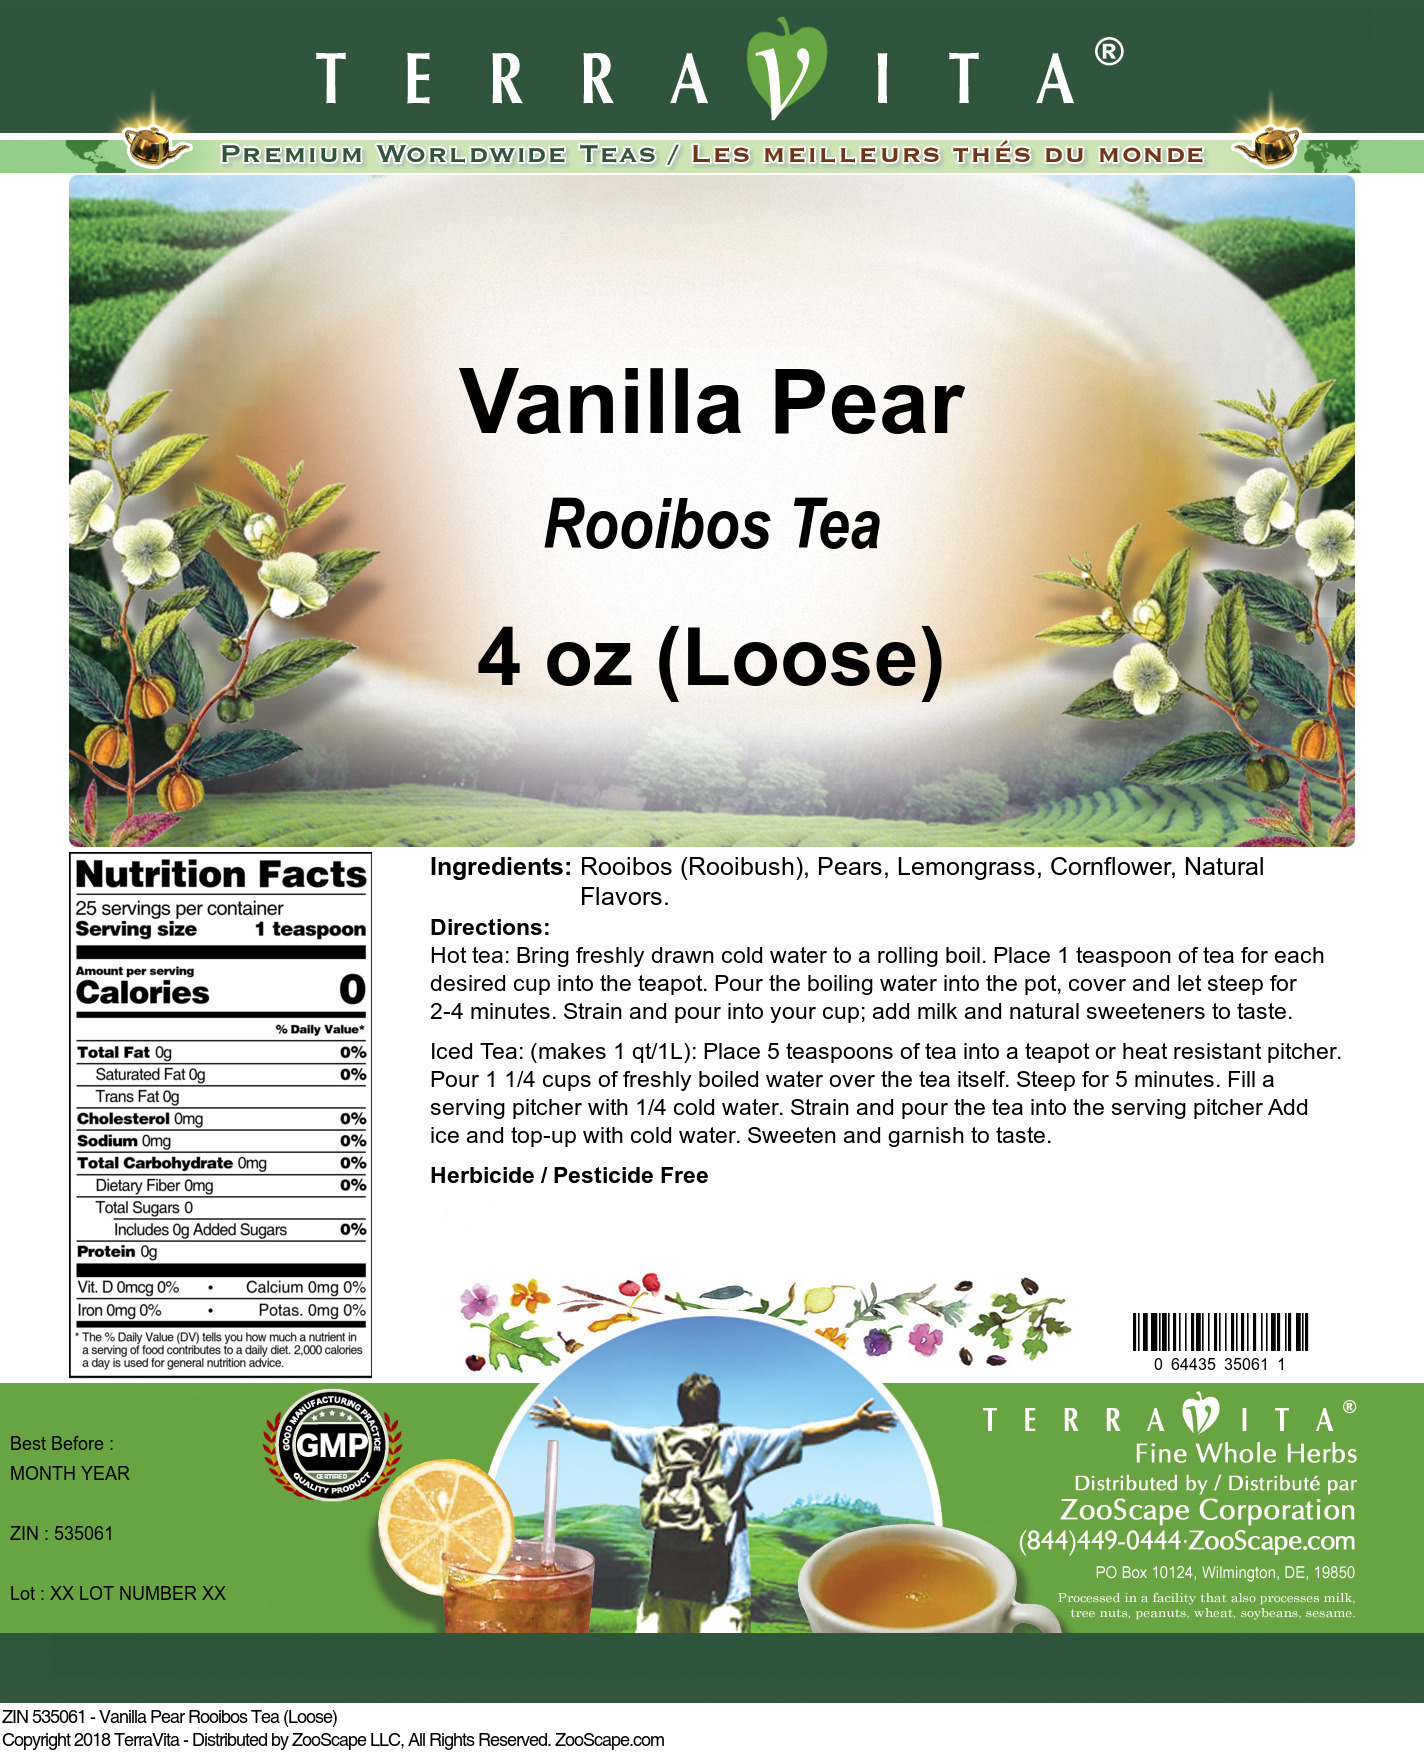 Vanilla Pear Rooibos Tea